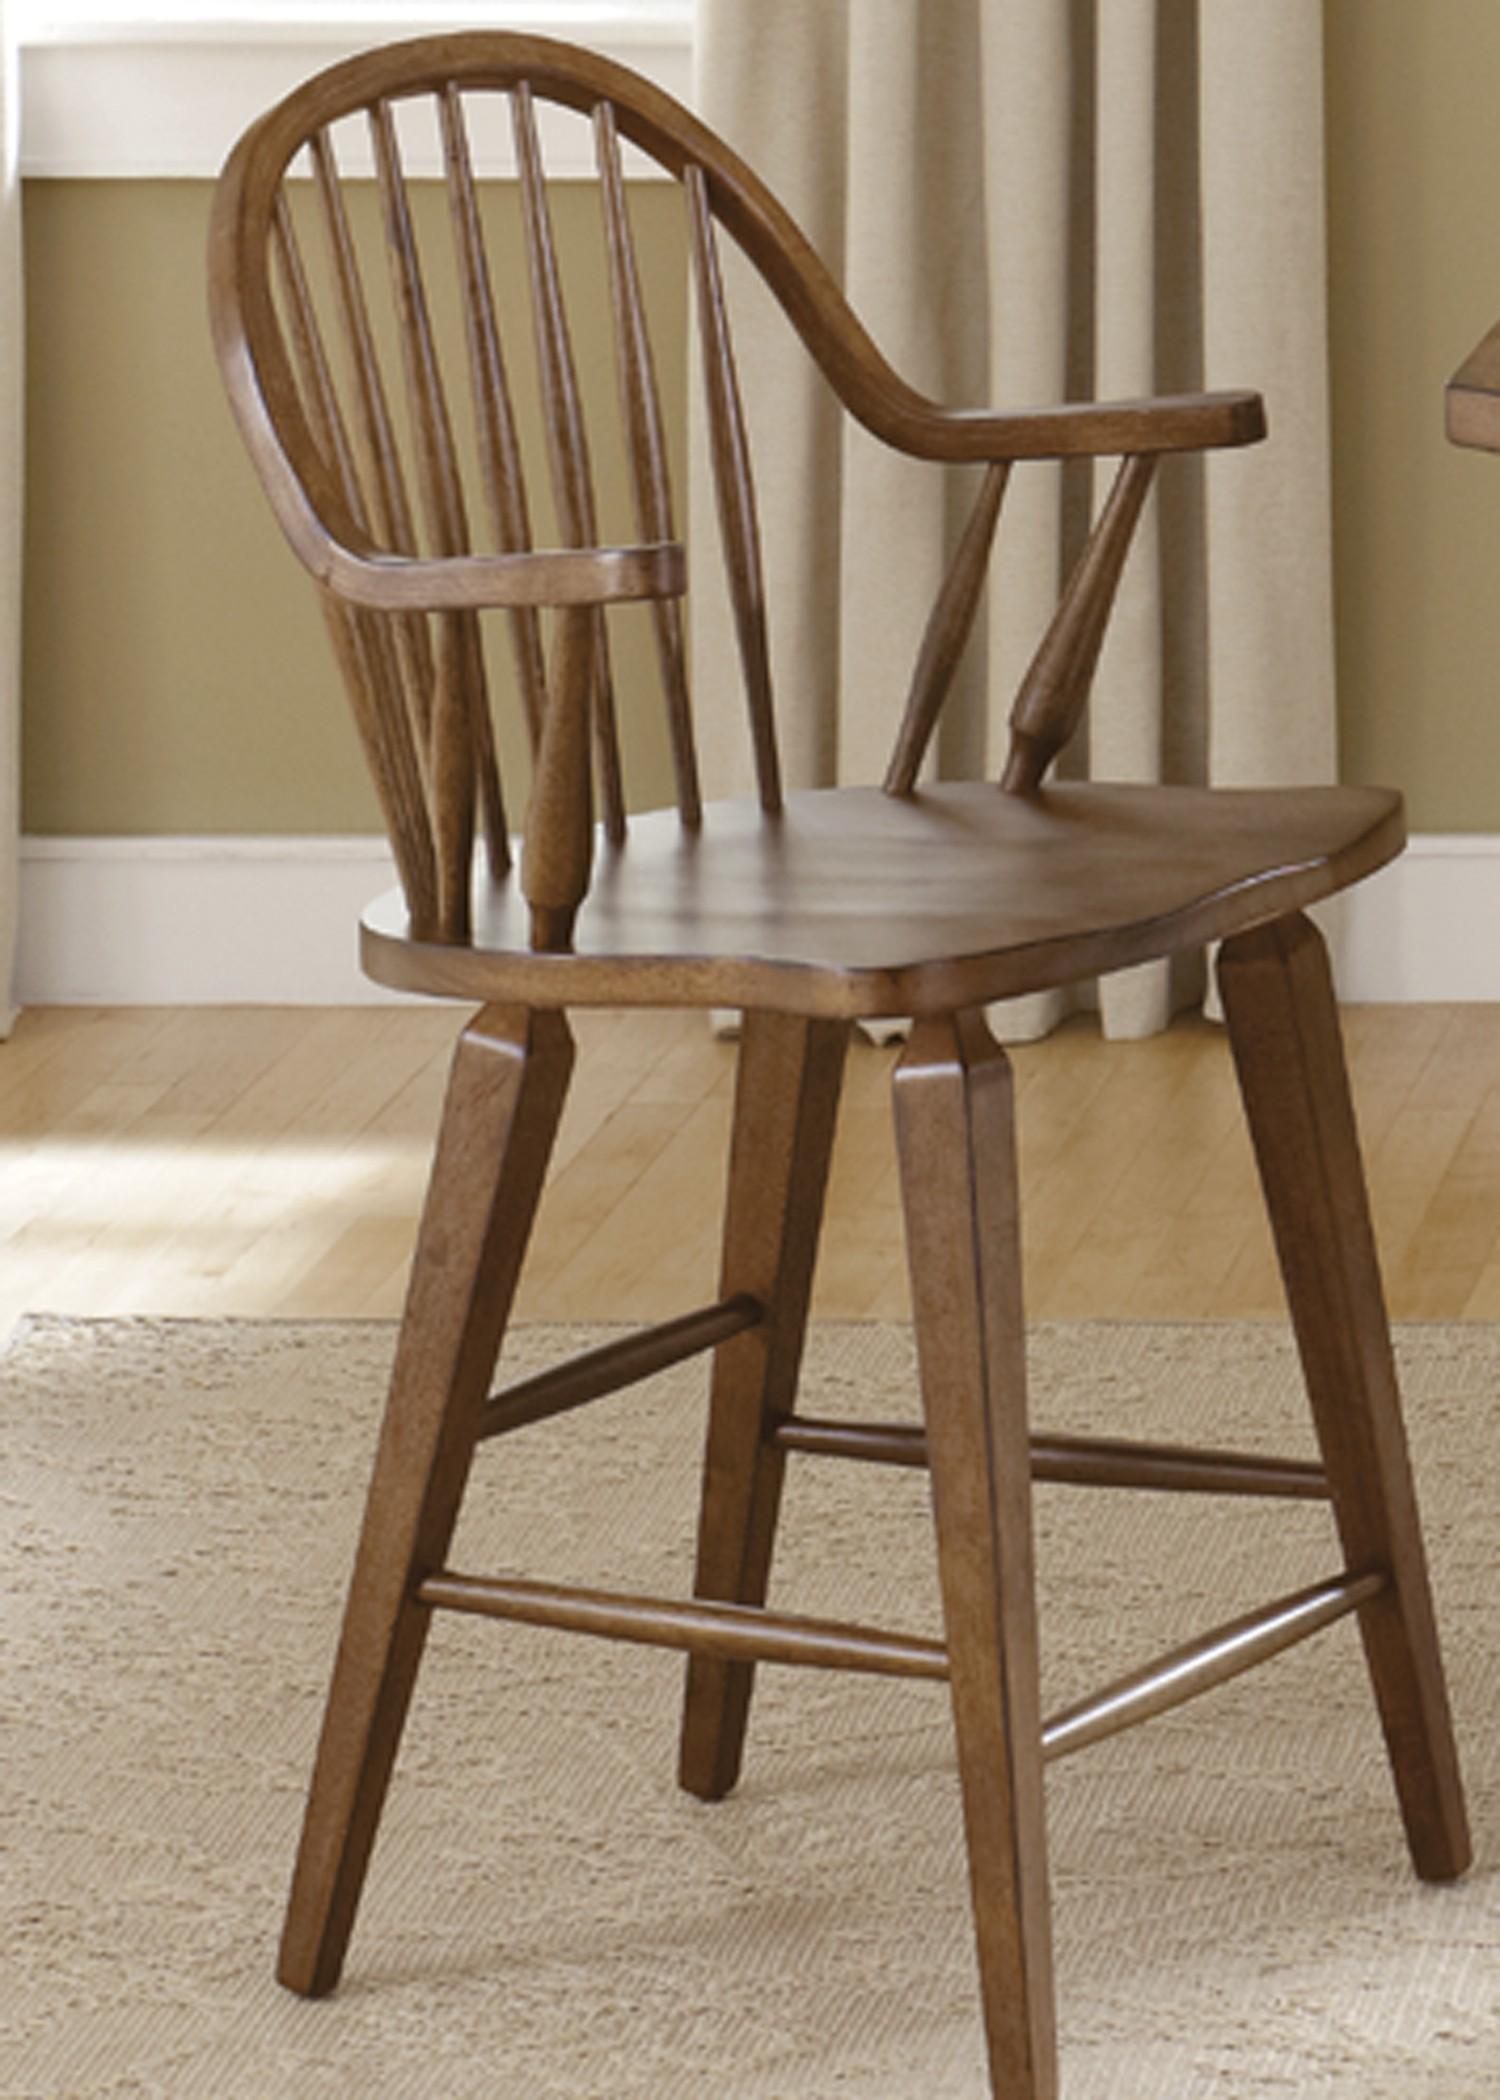 Hearthstone Rustic Oak 24 Inch Swivel Counter Chair From